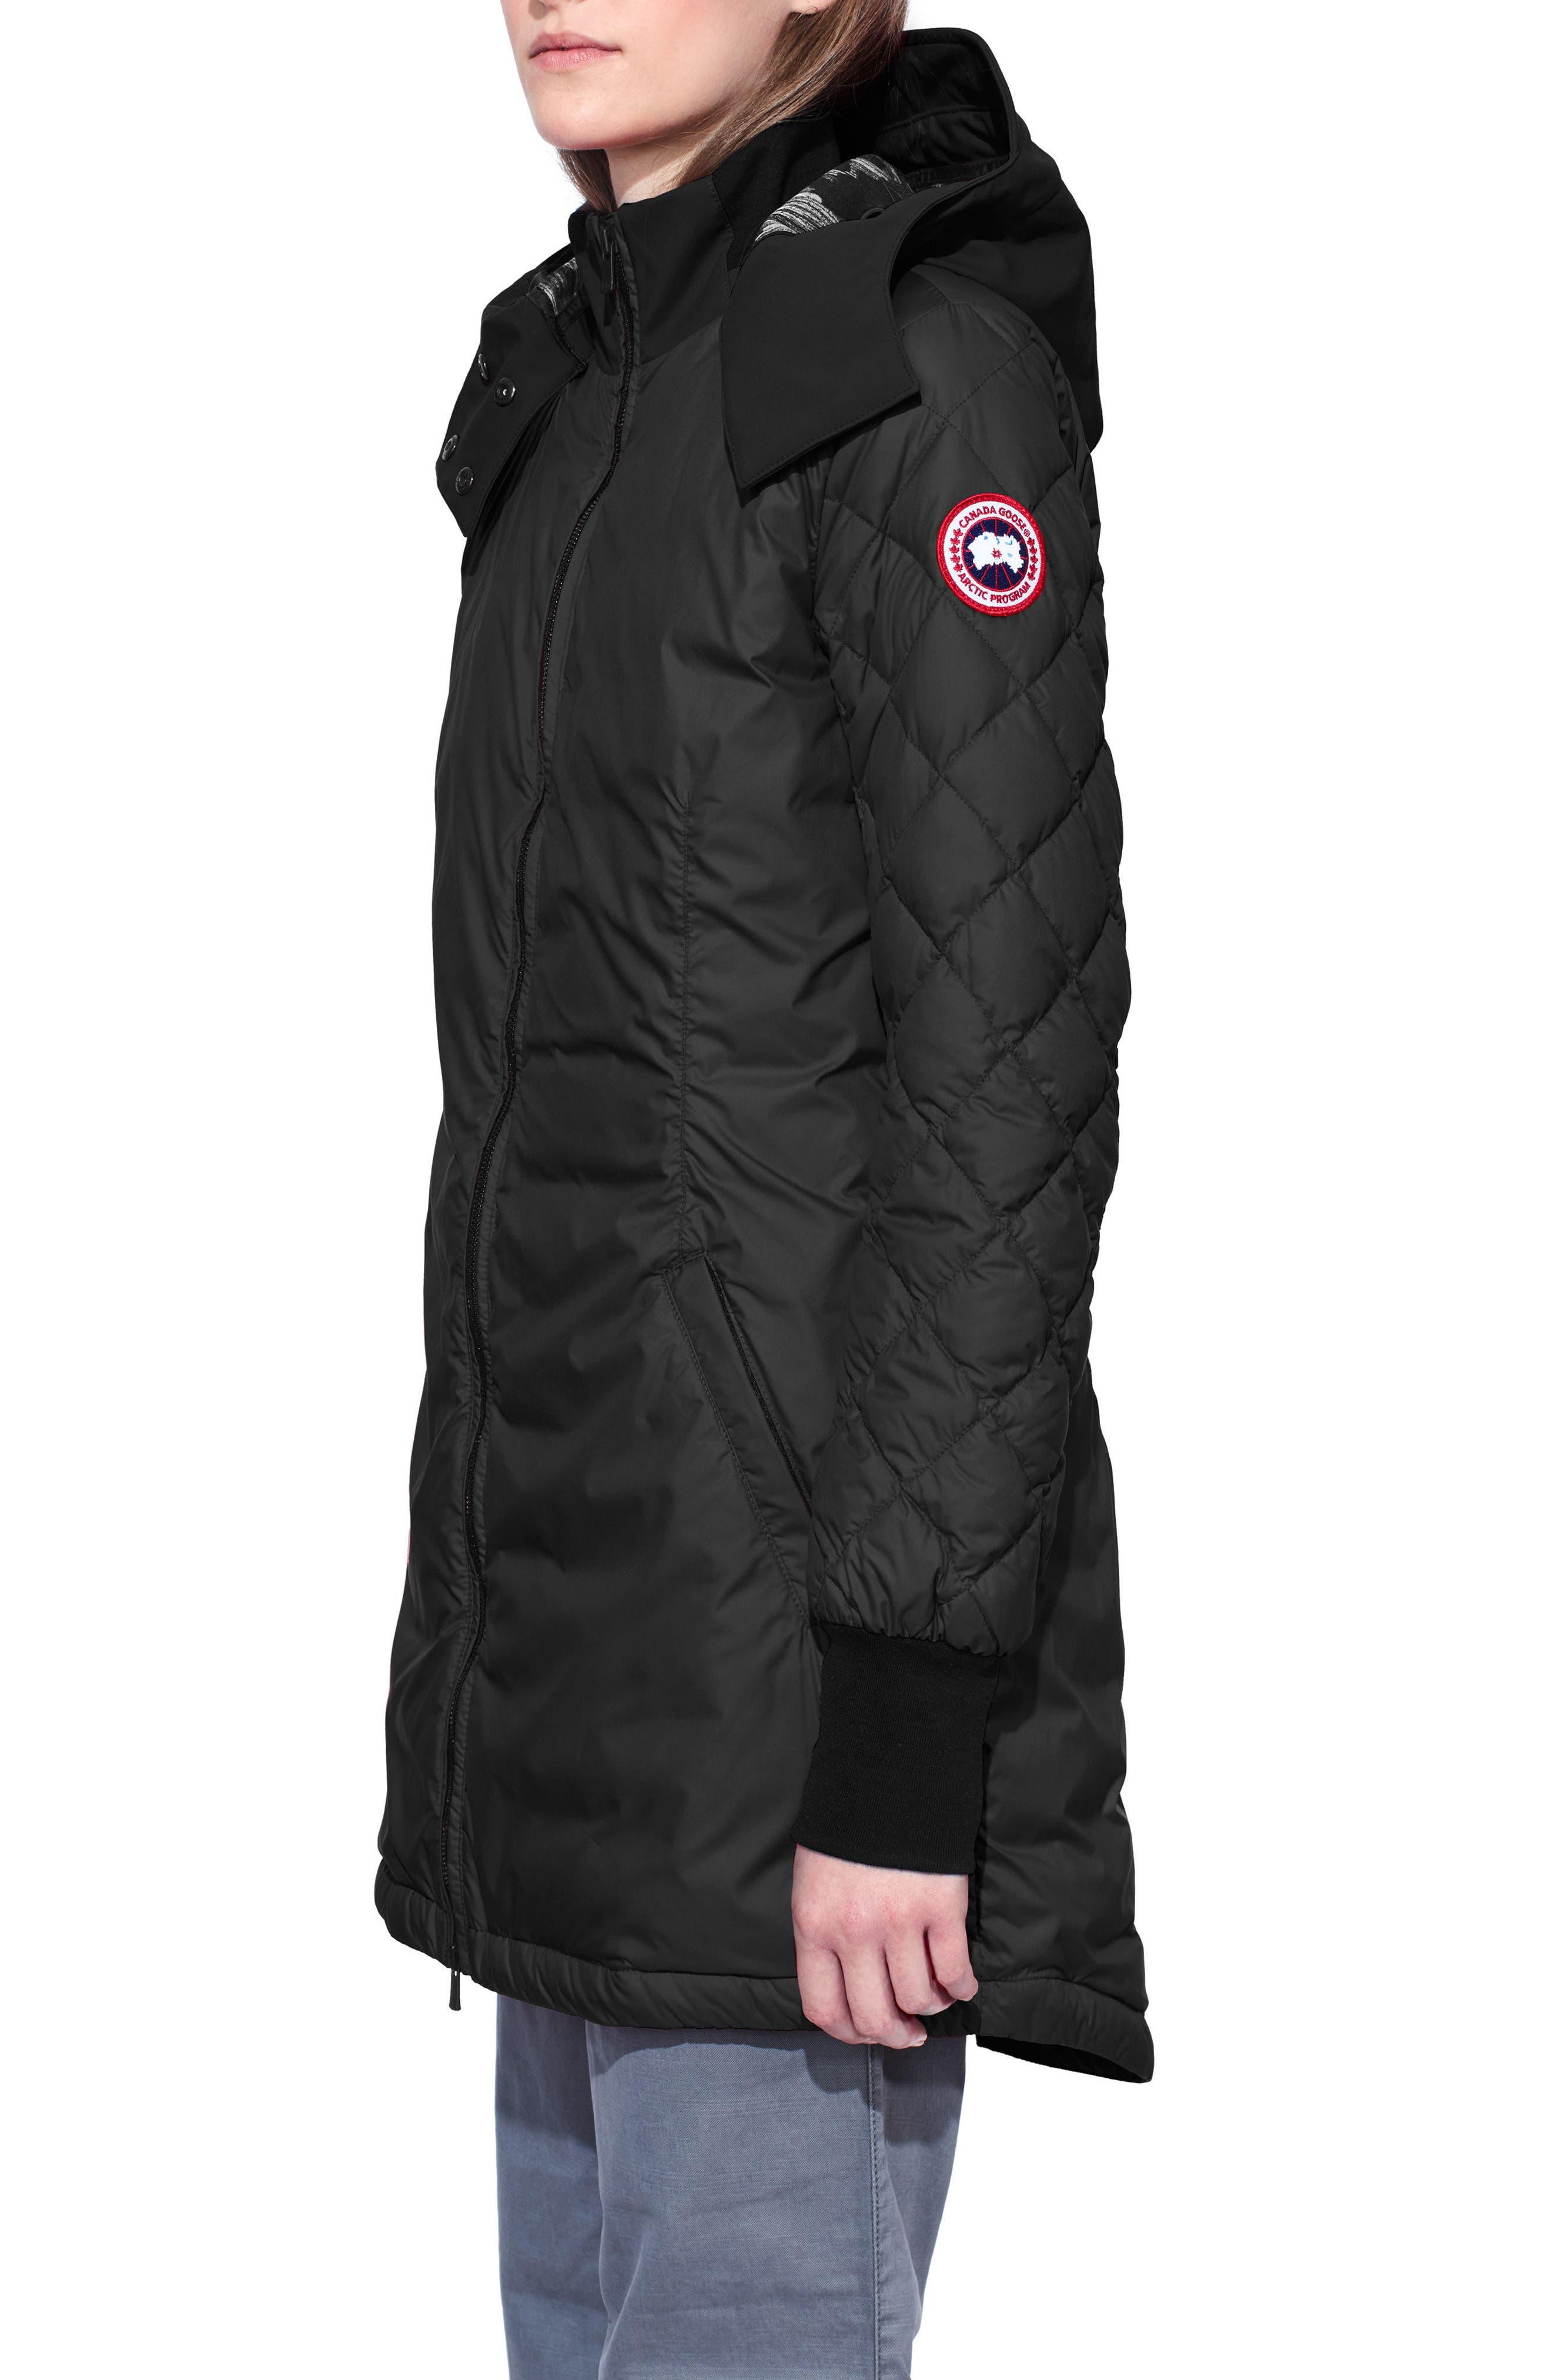 Stellarton Slim Fit Down Coat,                             Alternate thumbnail 3, color,                             Black/ Black